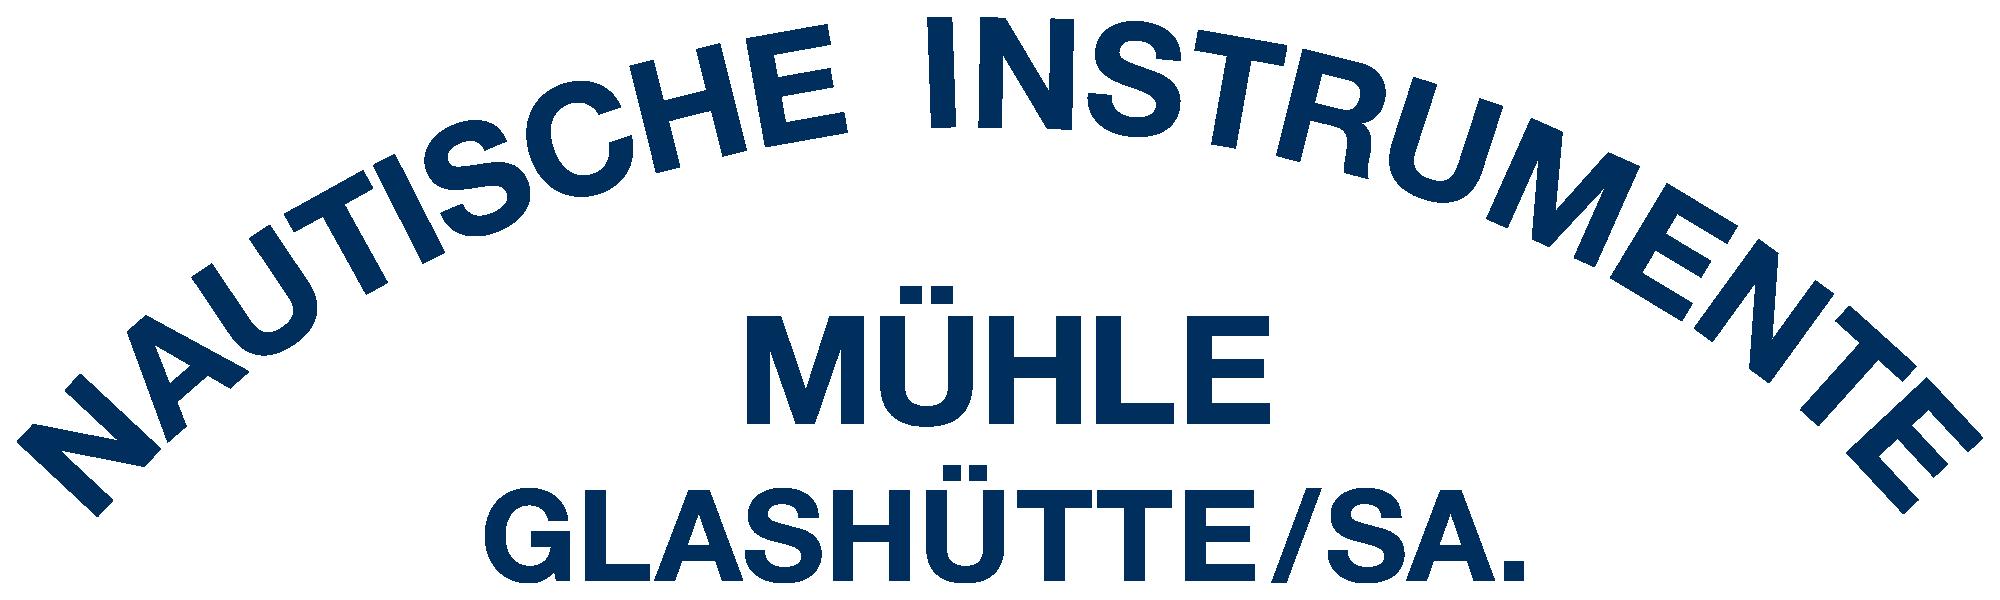 Mühle Glashütte logo